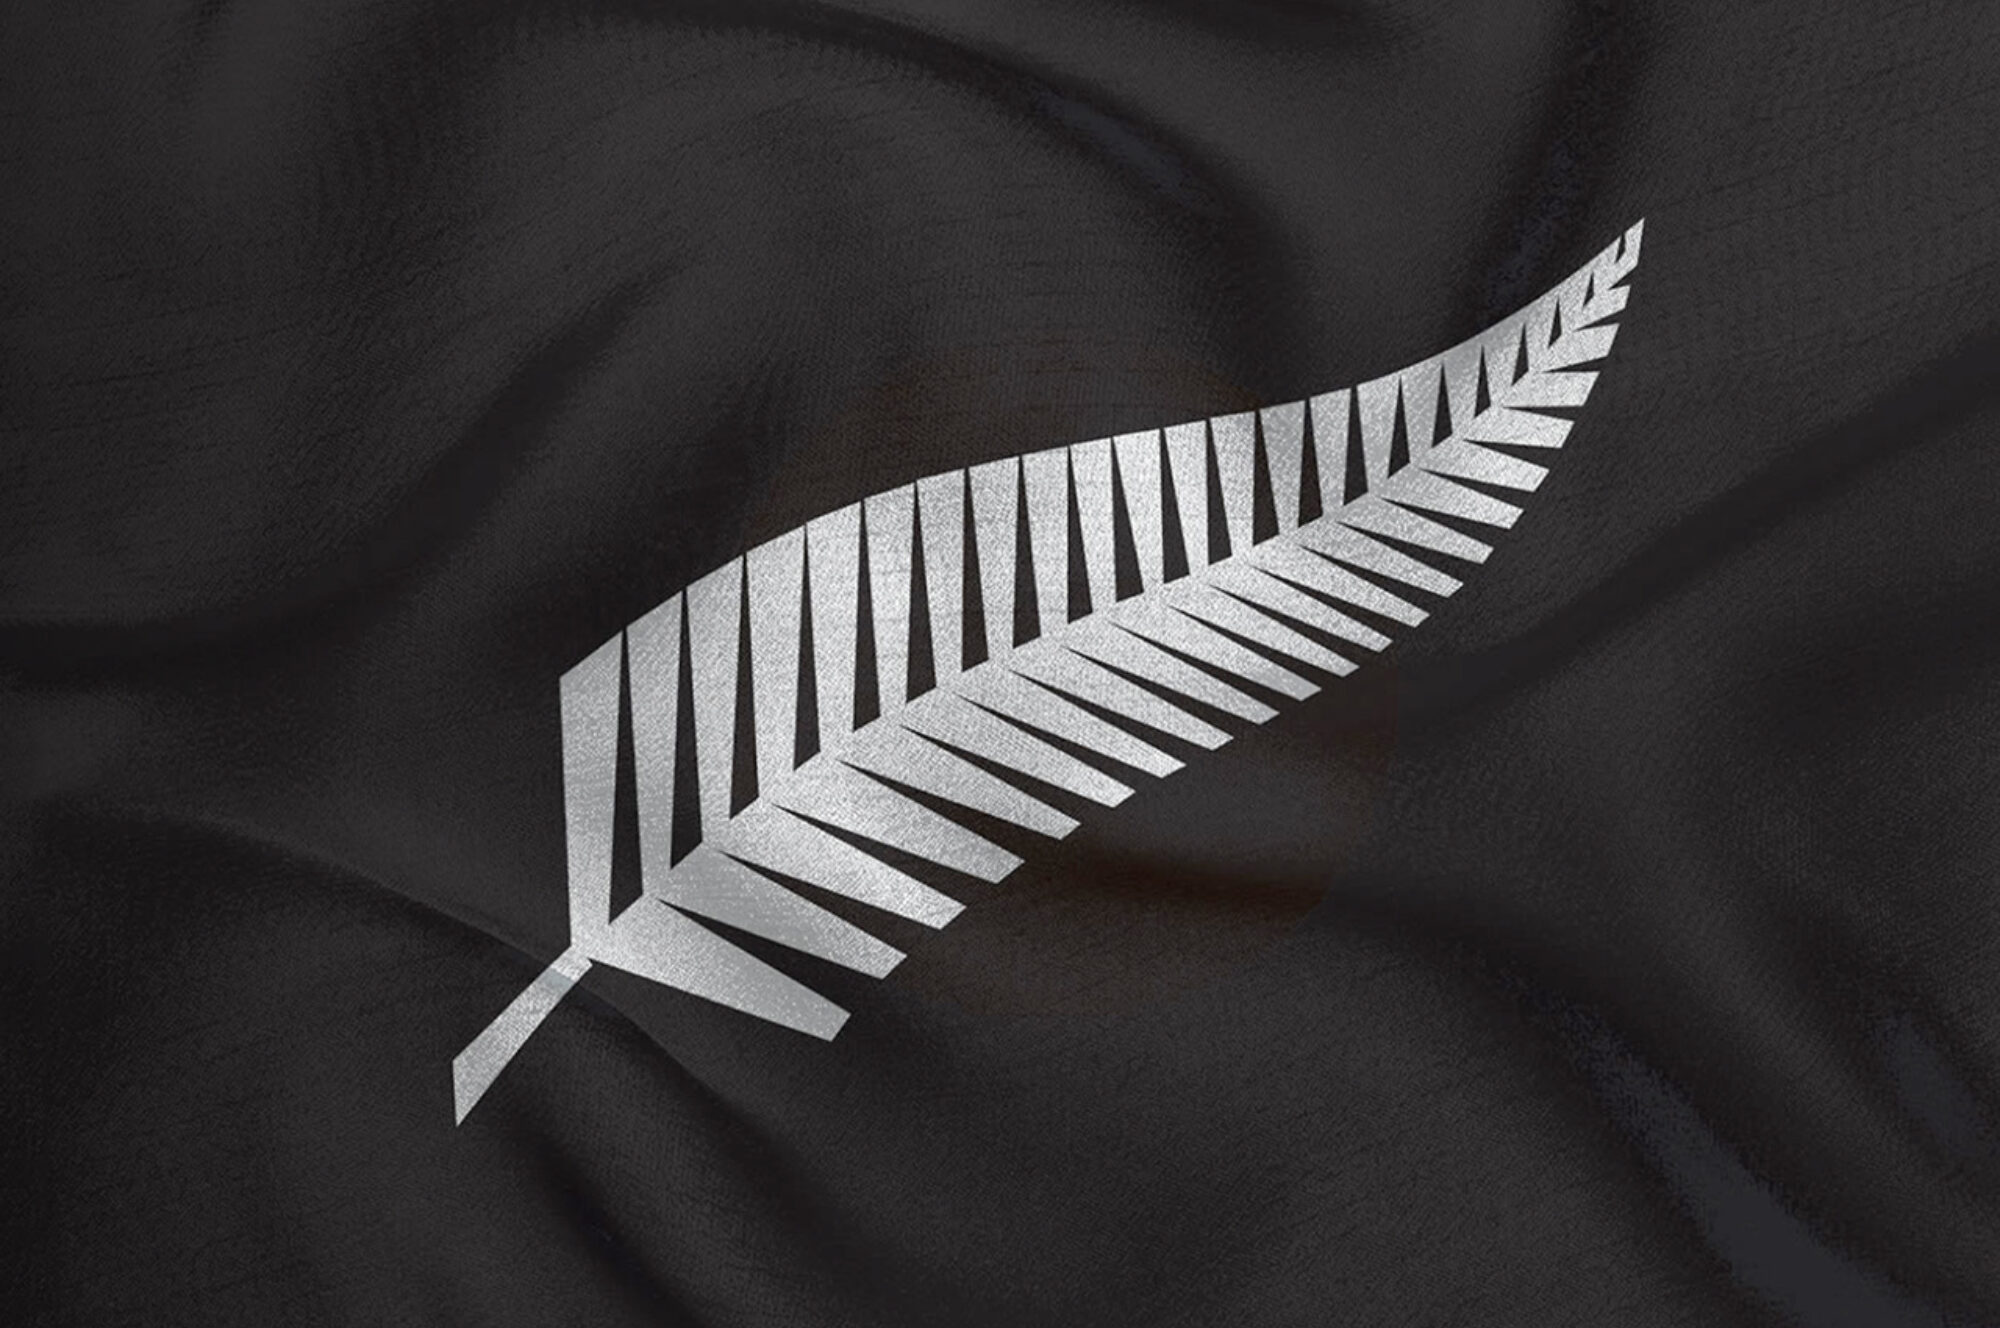 NZRFU Silverfern brandmark logo